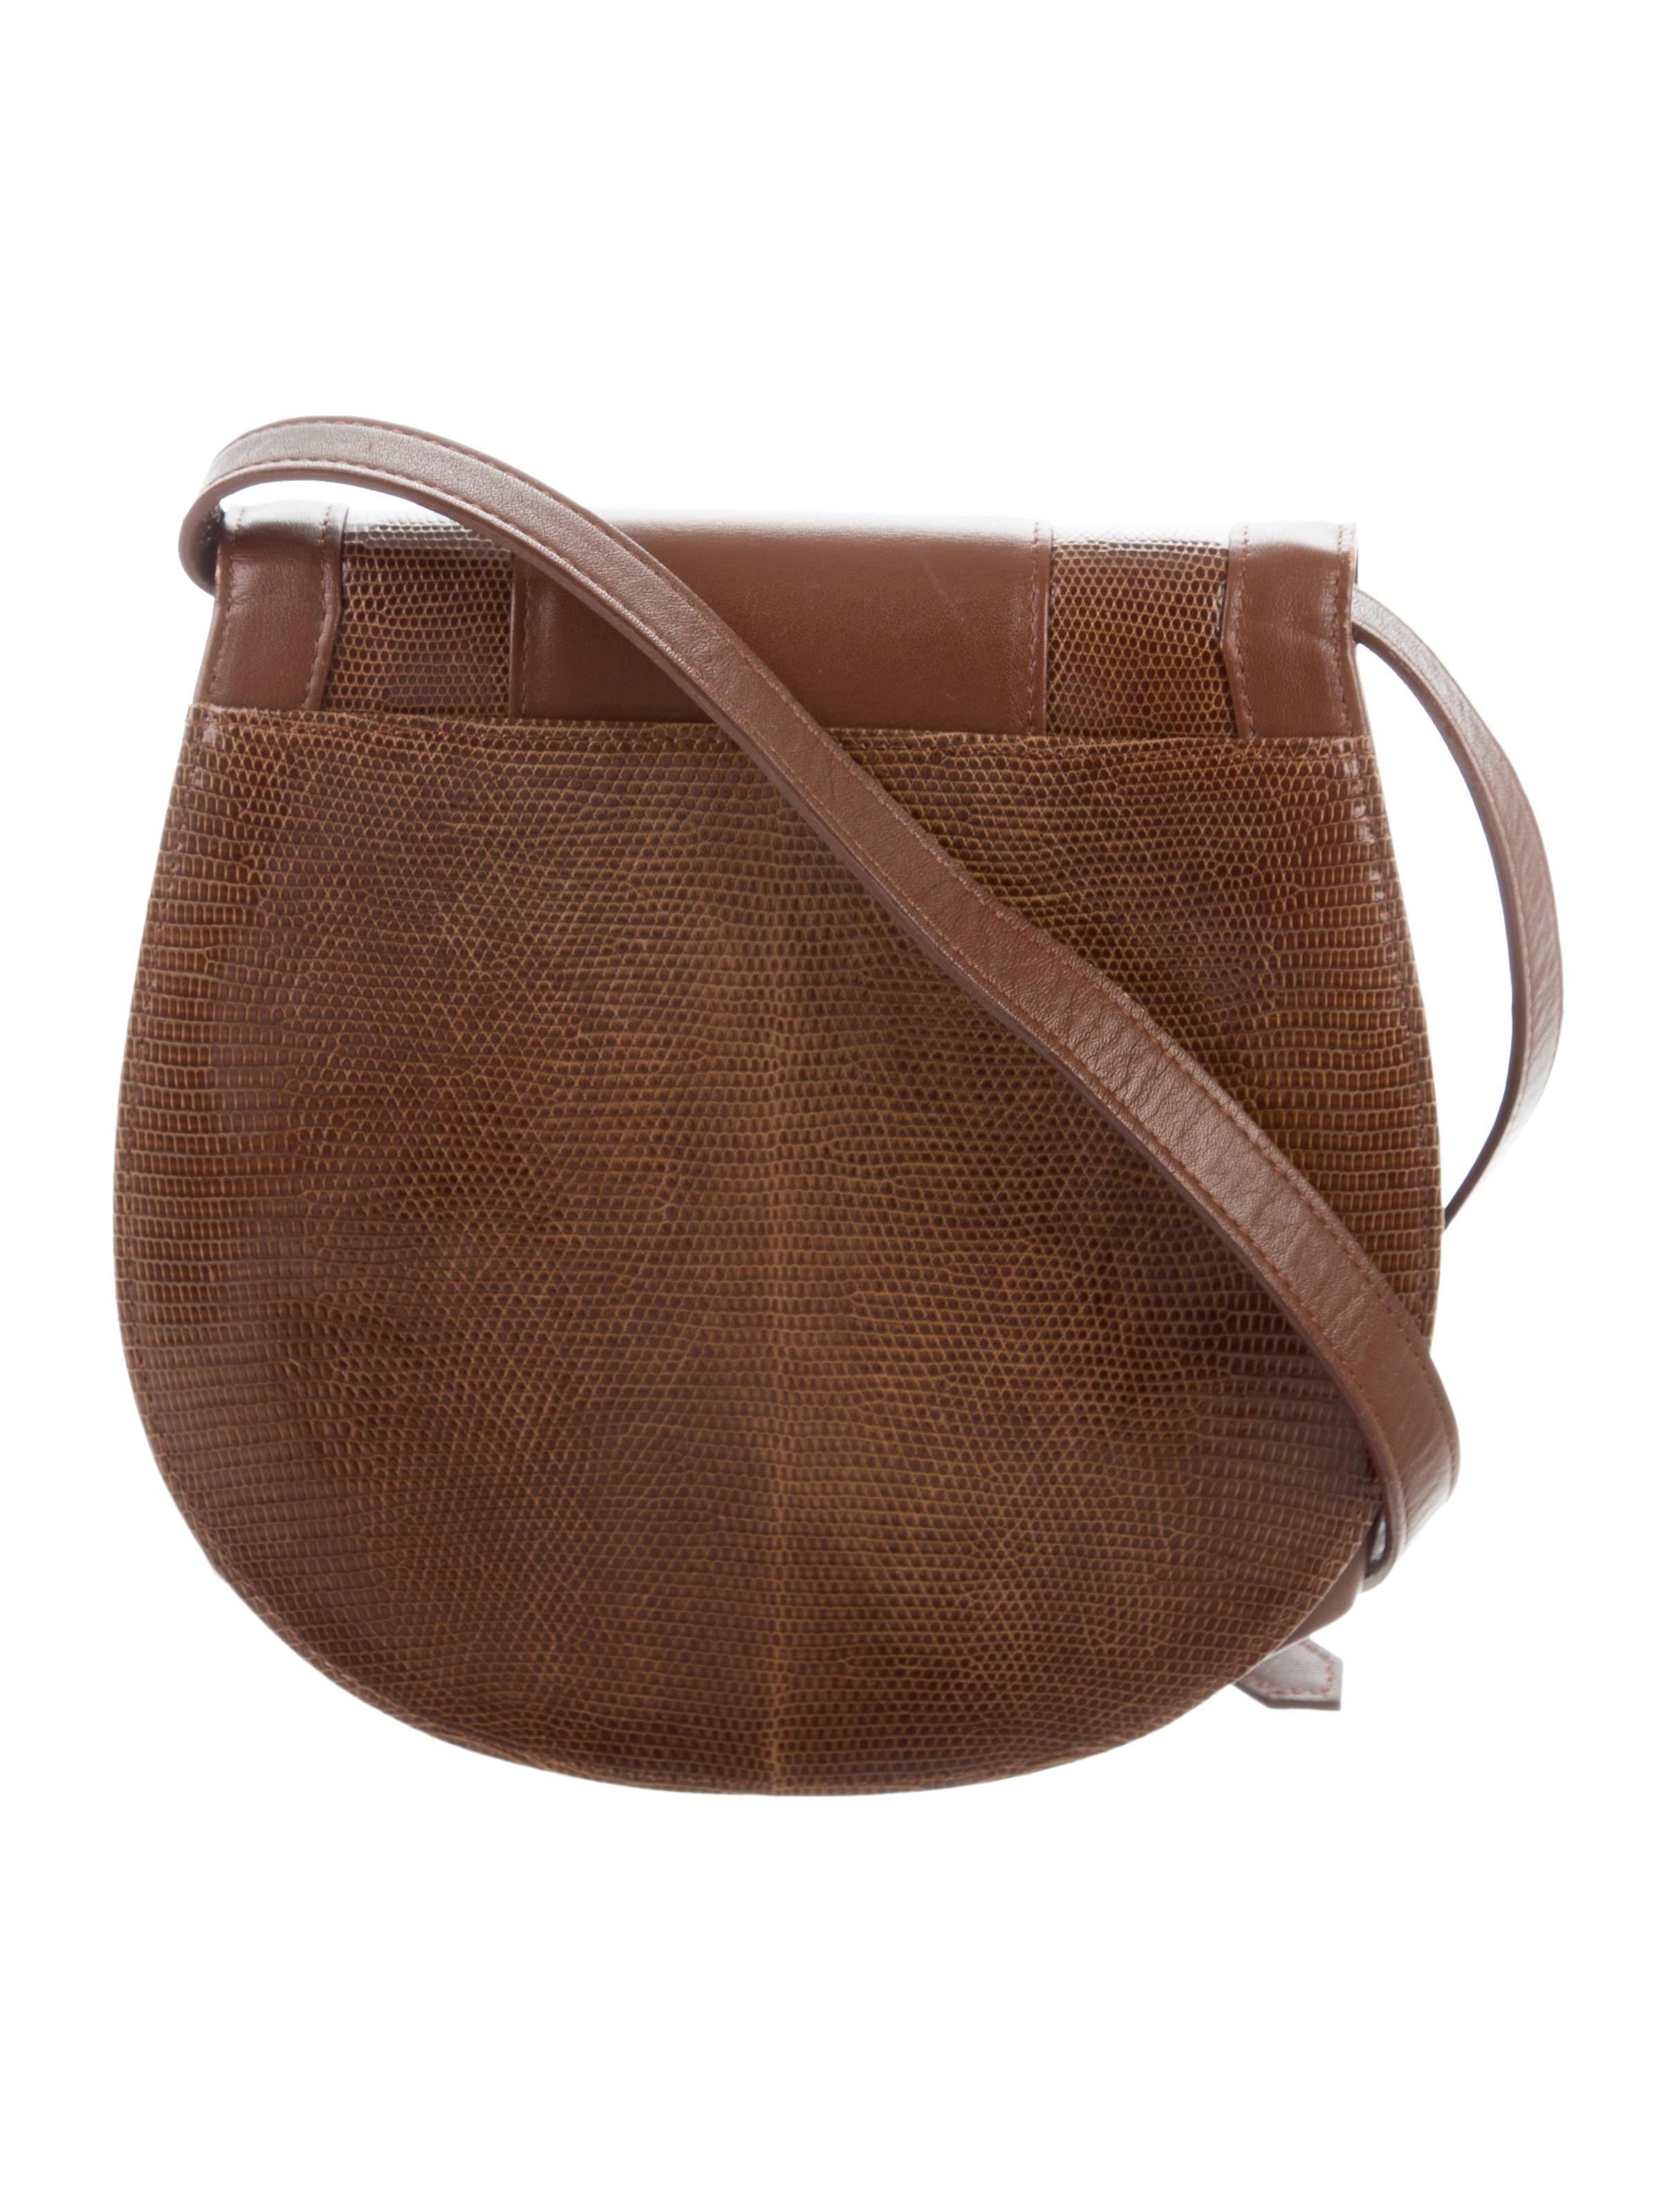 Yves Saint Laurent Lizard & Leather Crossbody Bag ...